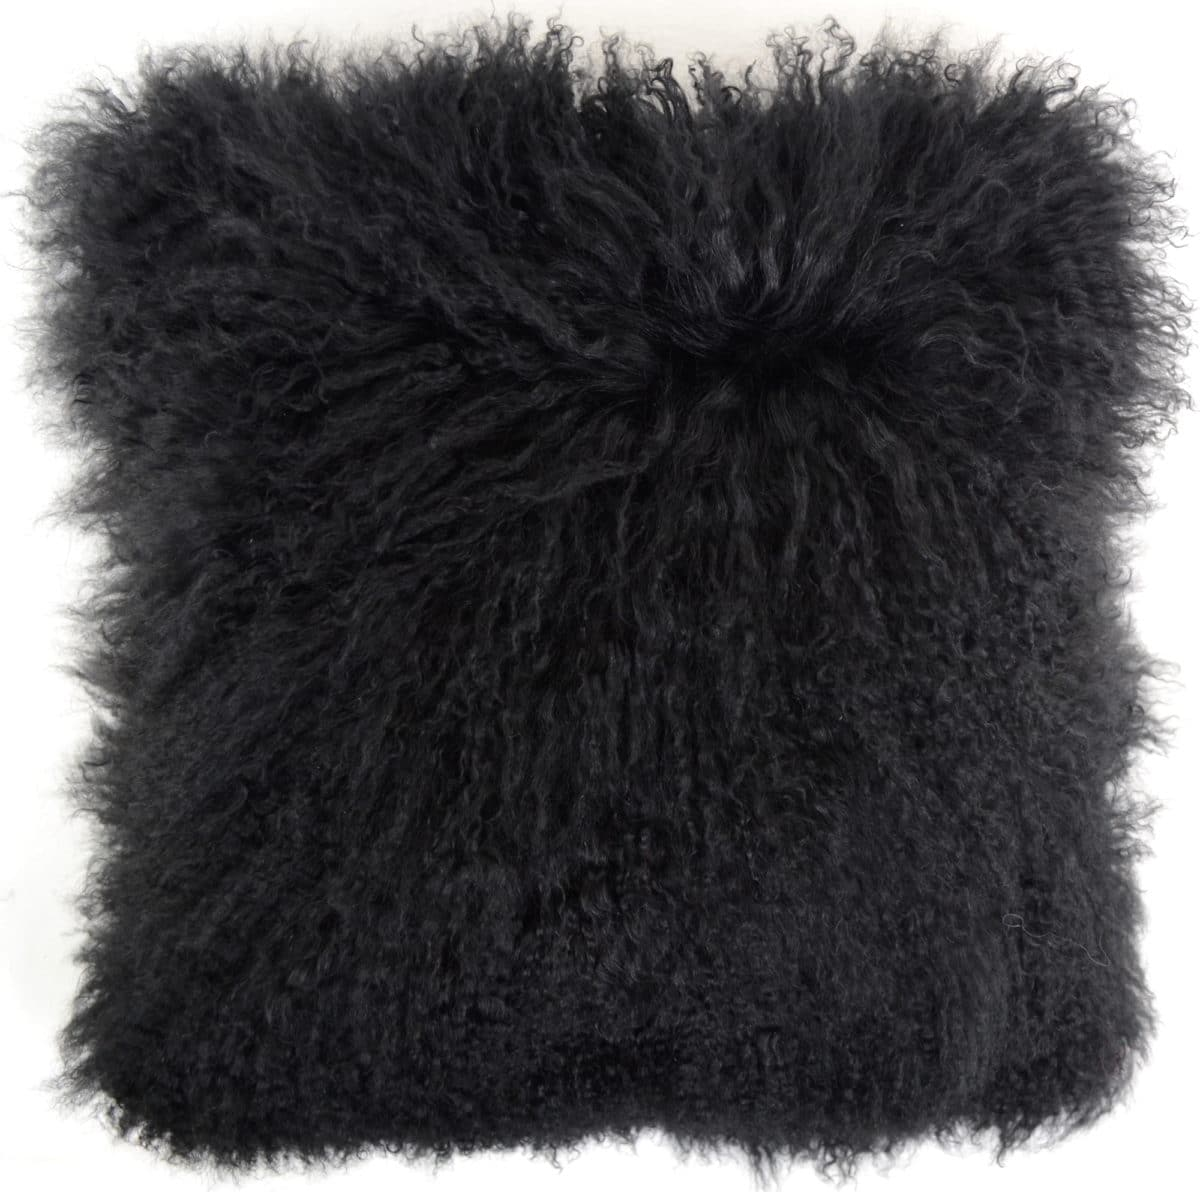 Snugrugs Mongolian Sheepskin Cushion 40cm x 40cm – Black